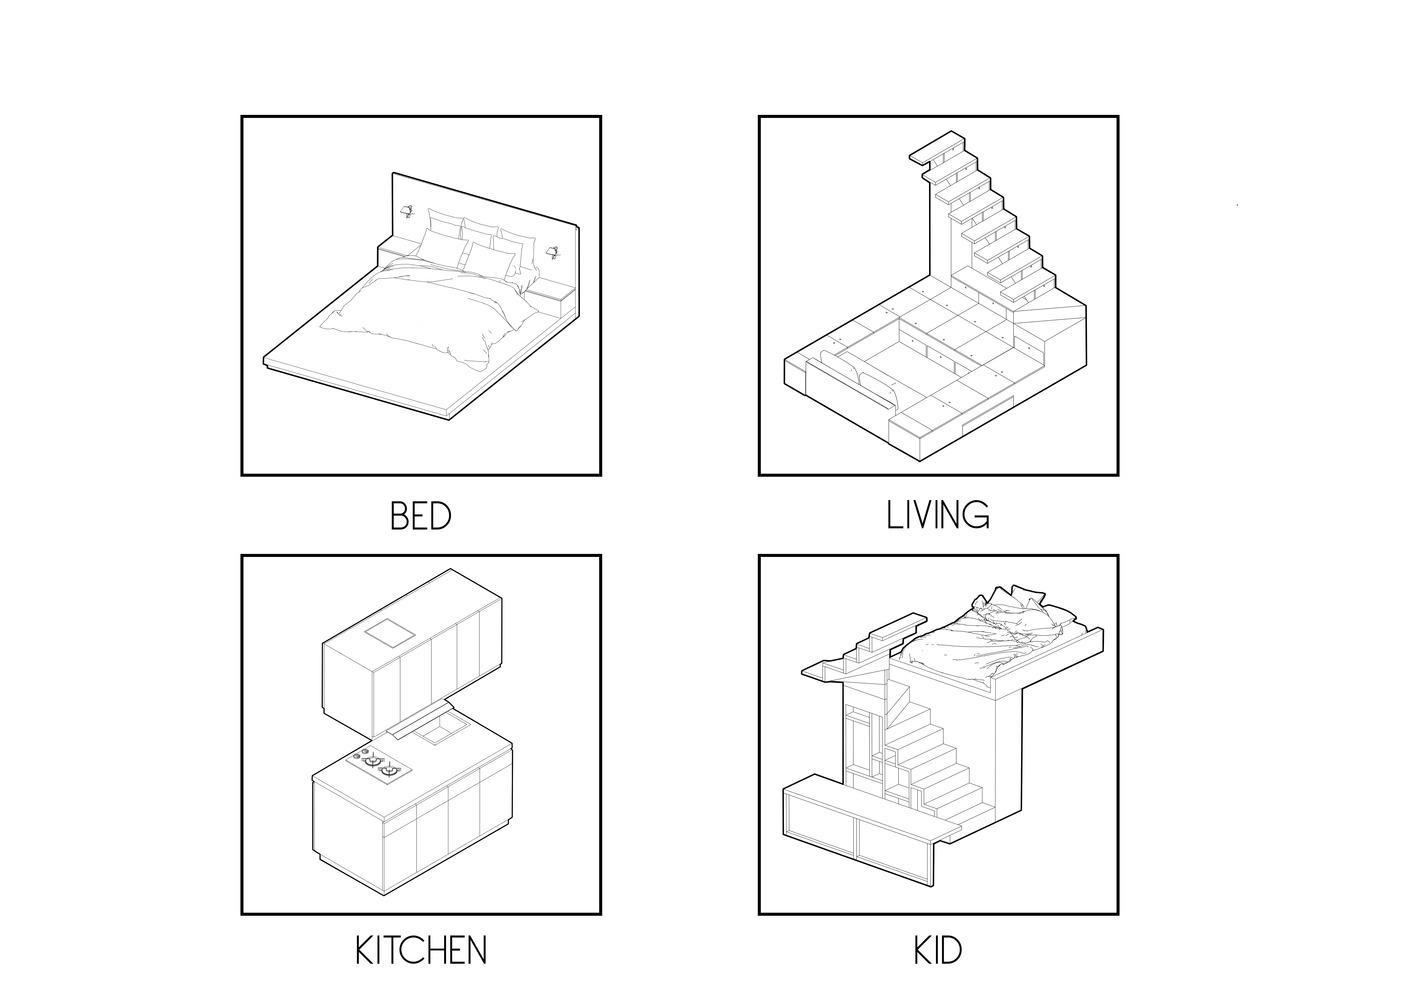 3500 millimetre house plug and play diagram [ 1414 x 1000 Pixel ]